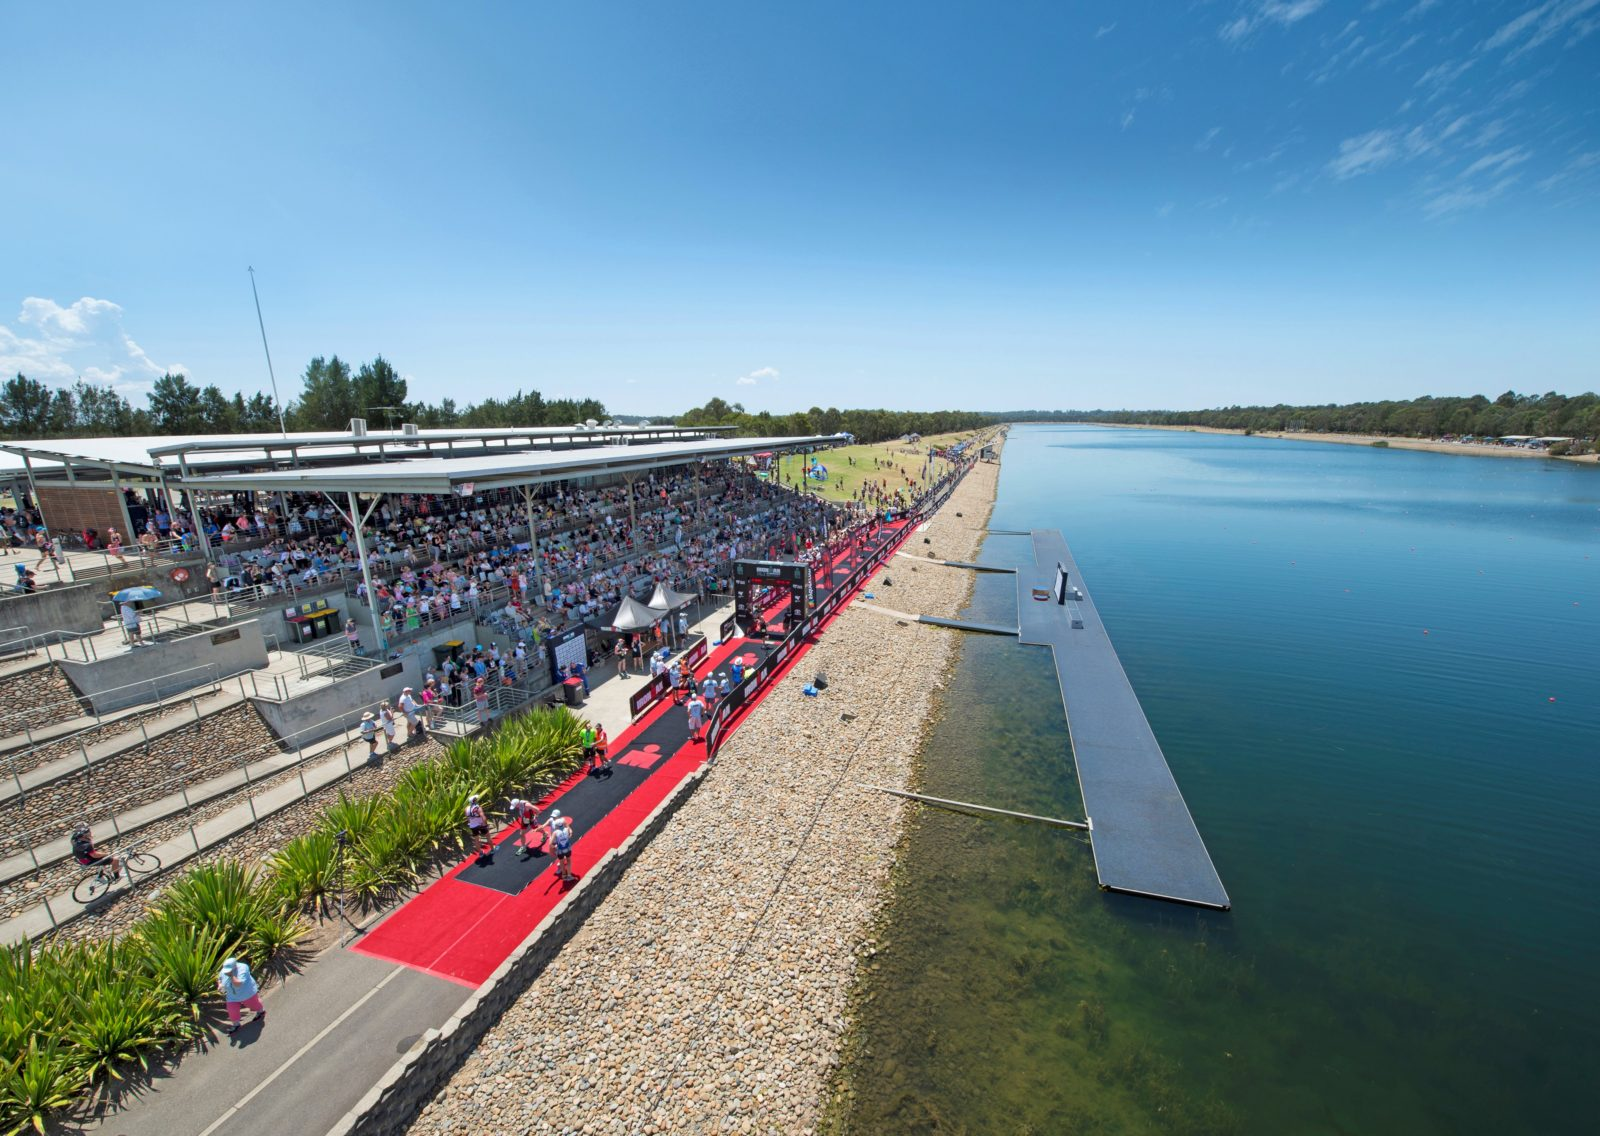 The Sydney International Regatta Centre